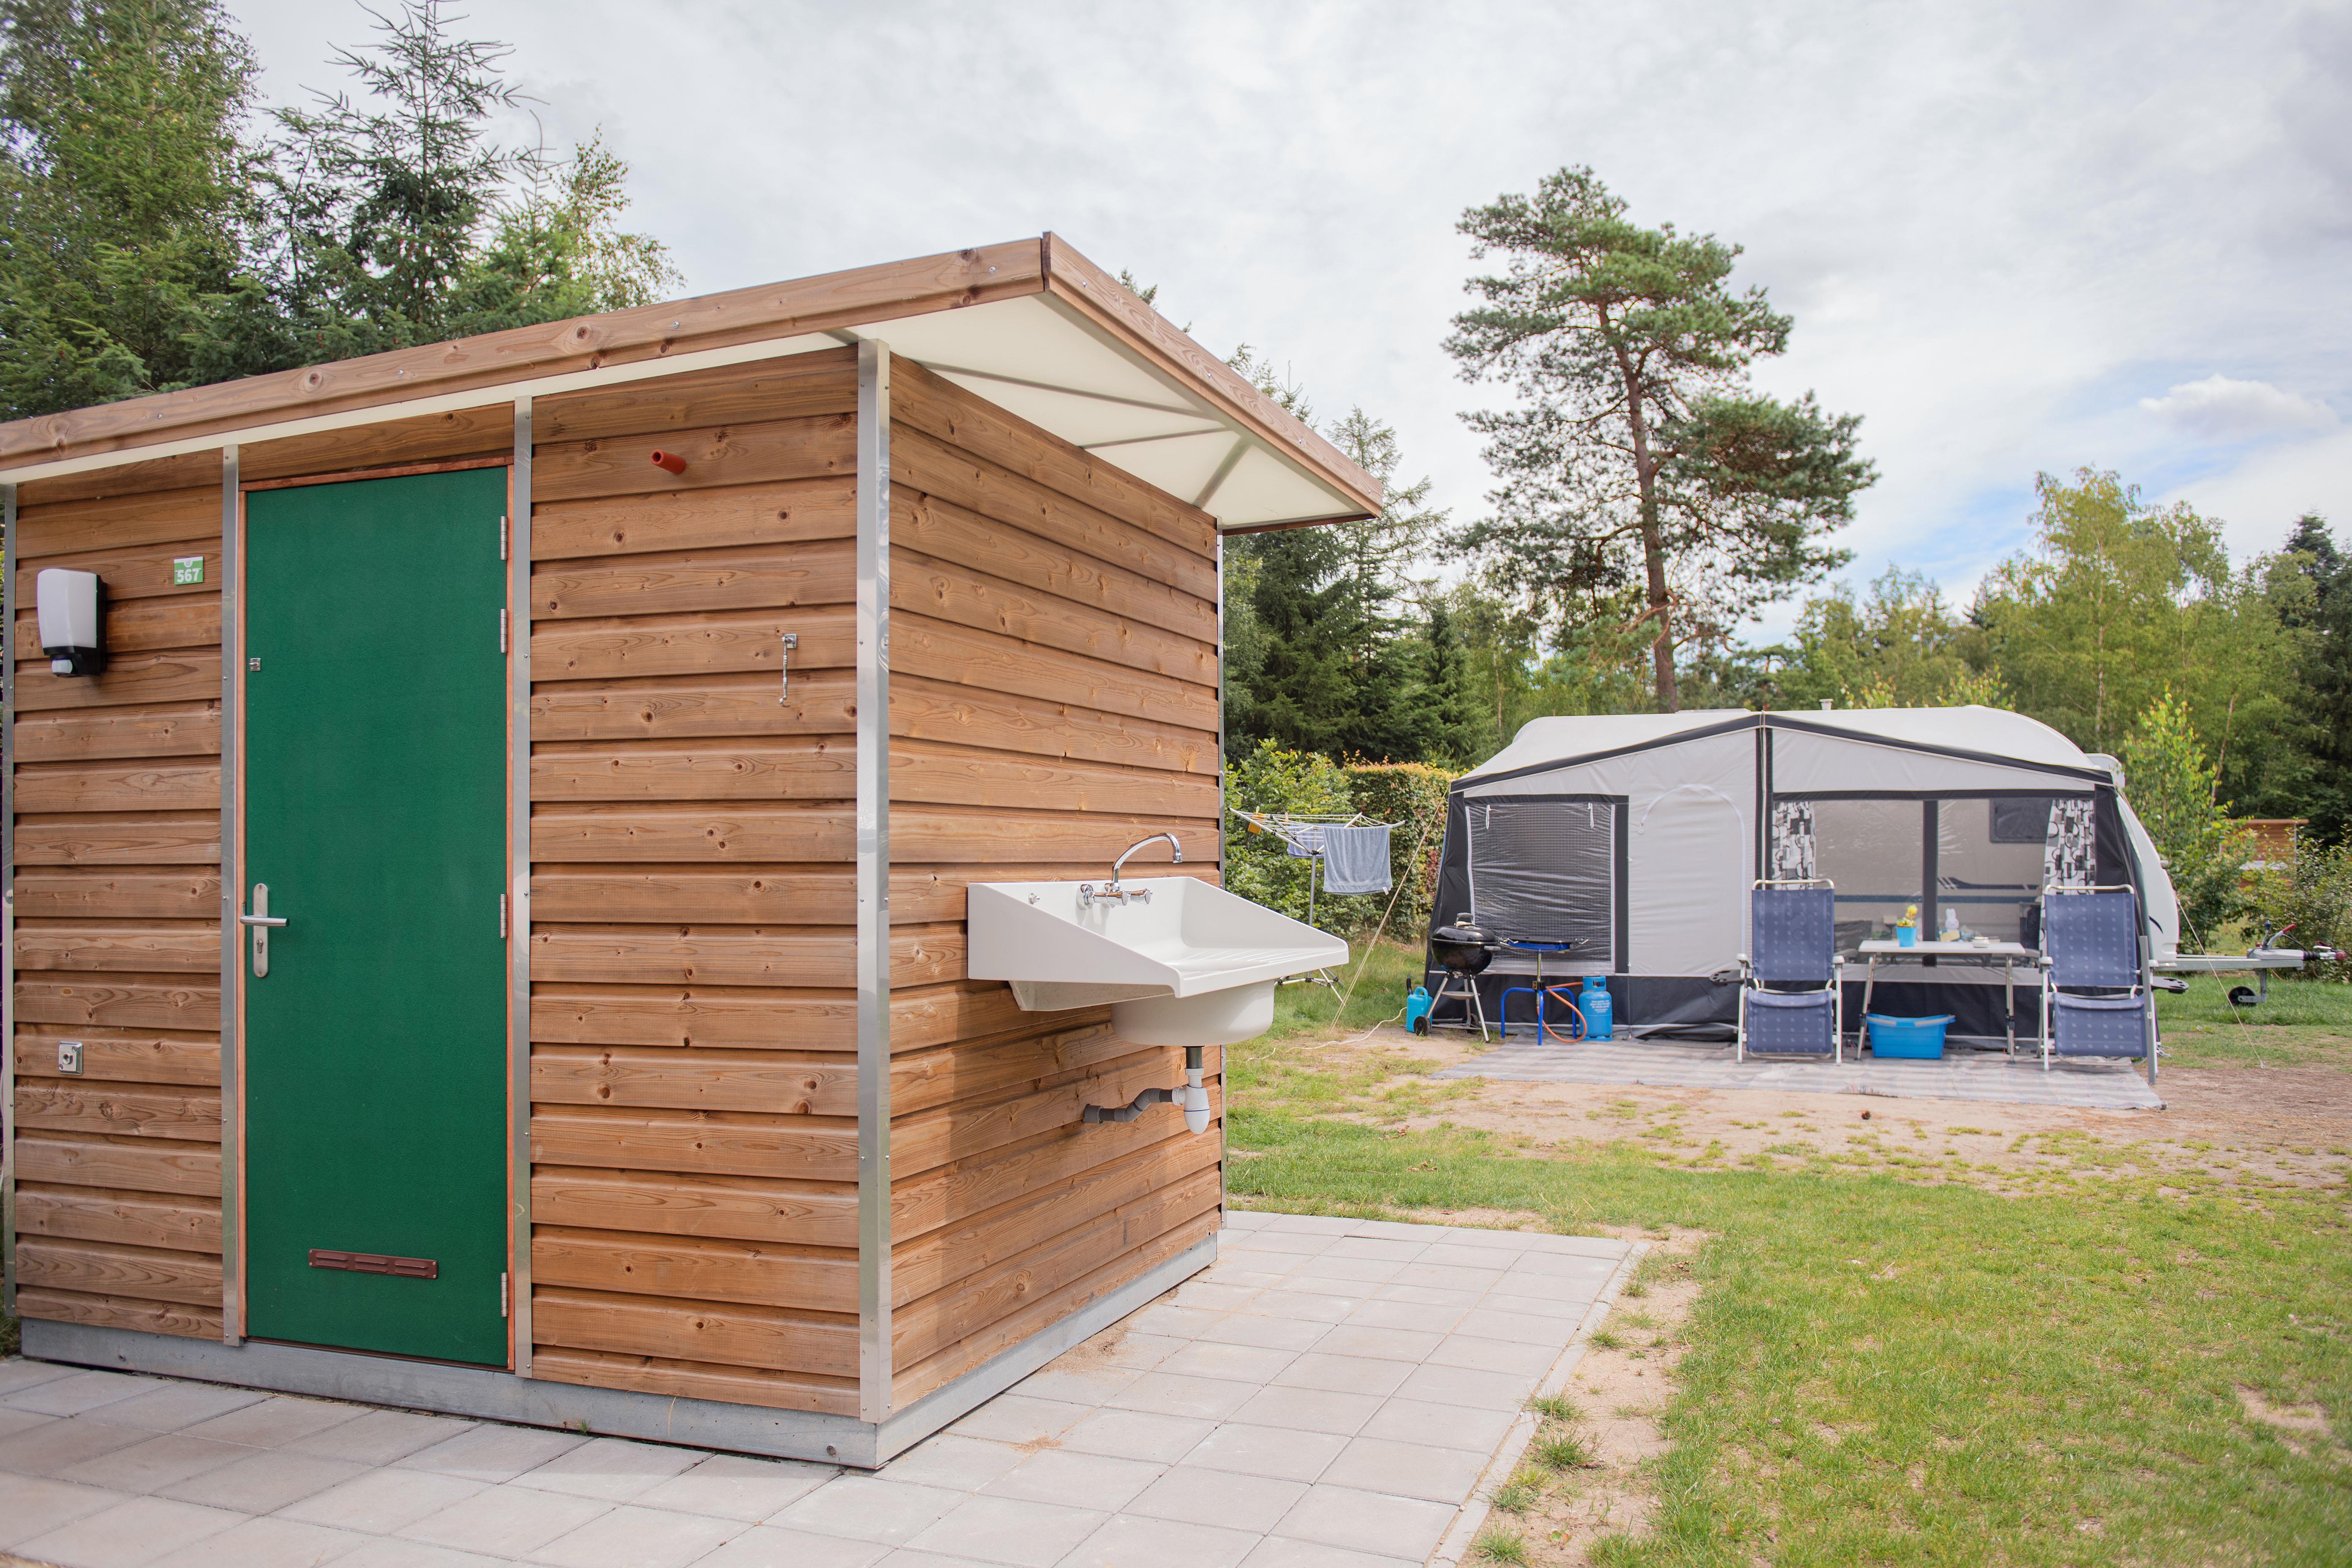 Emplacement - Emplacement Confort Deluxe Avec Sanitair Privé - Vakantiepark Koningshof